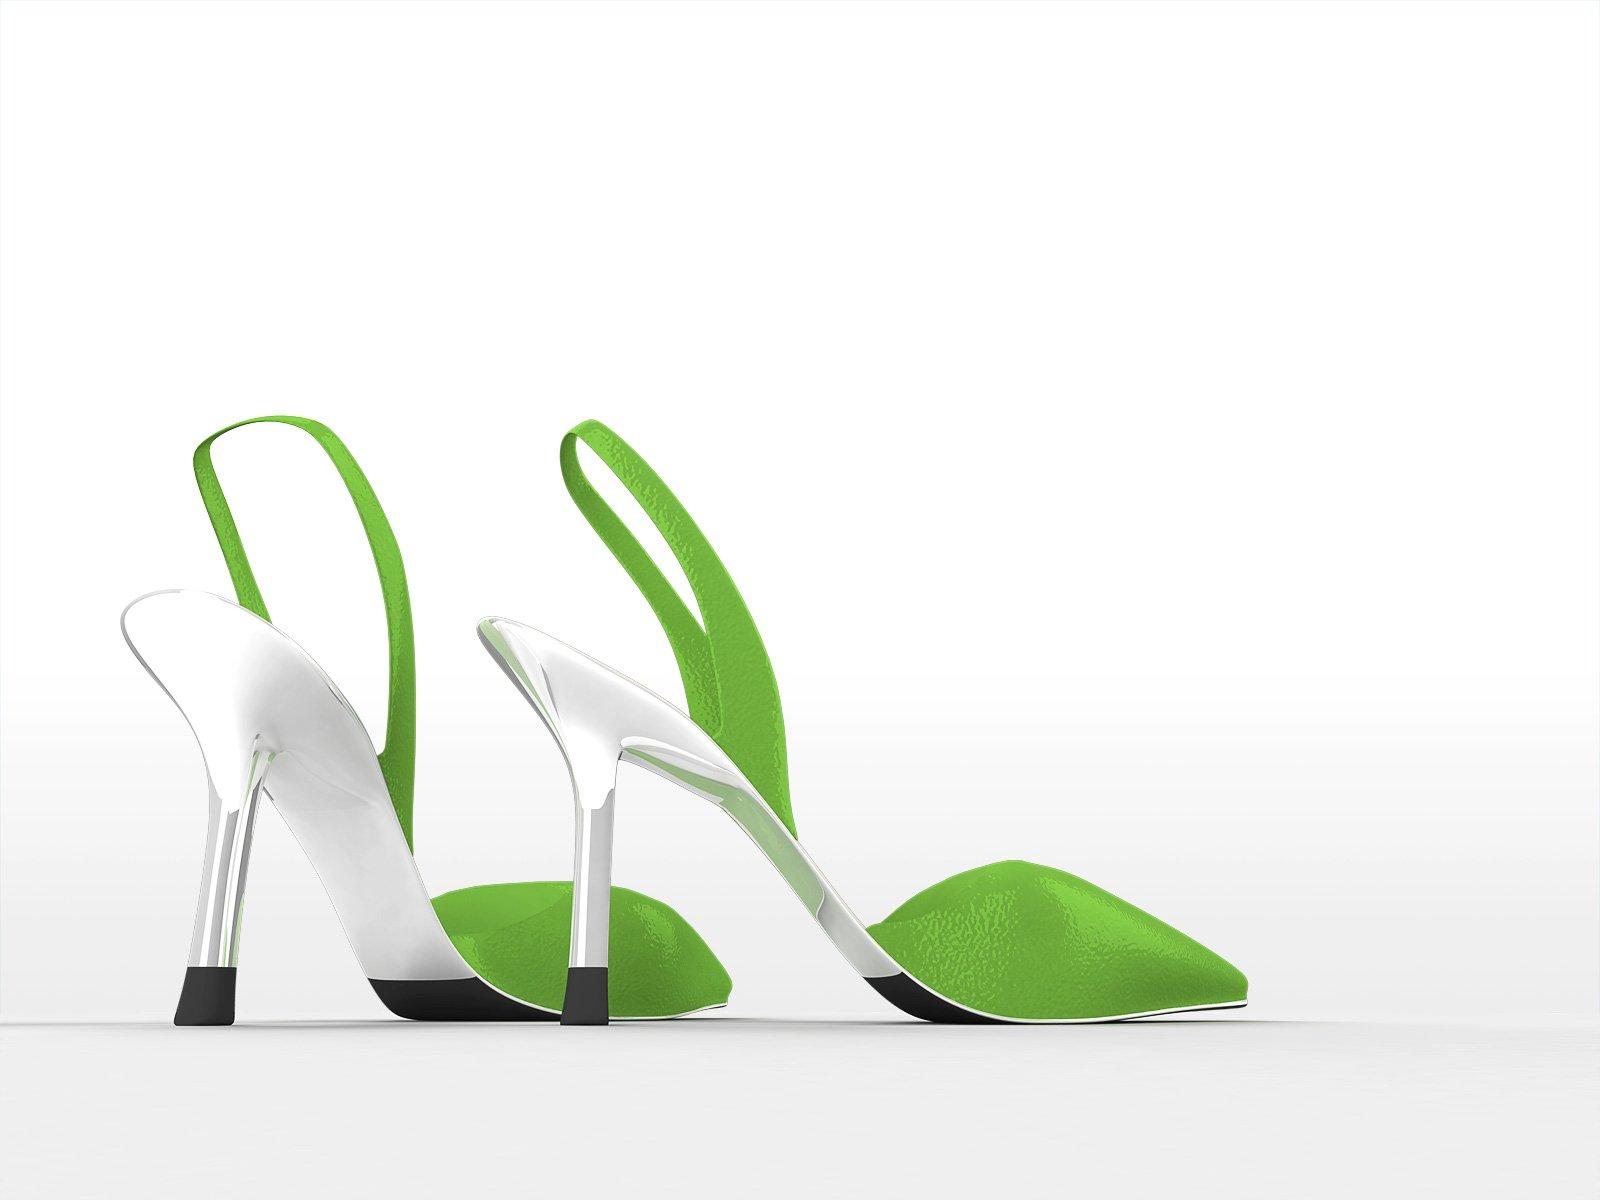 1600x1200 Green shoes desktop PC and Mac wallpaper 1600x1200